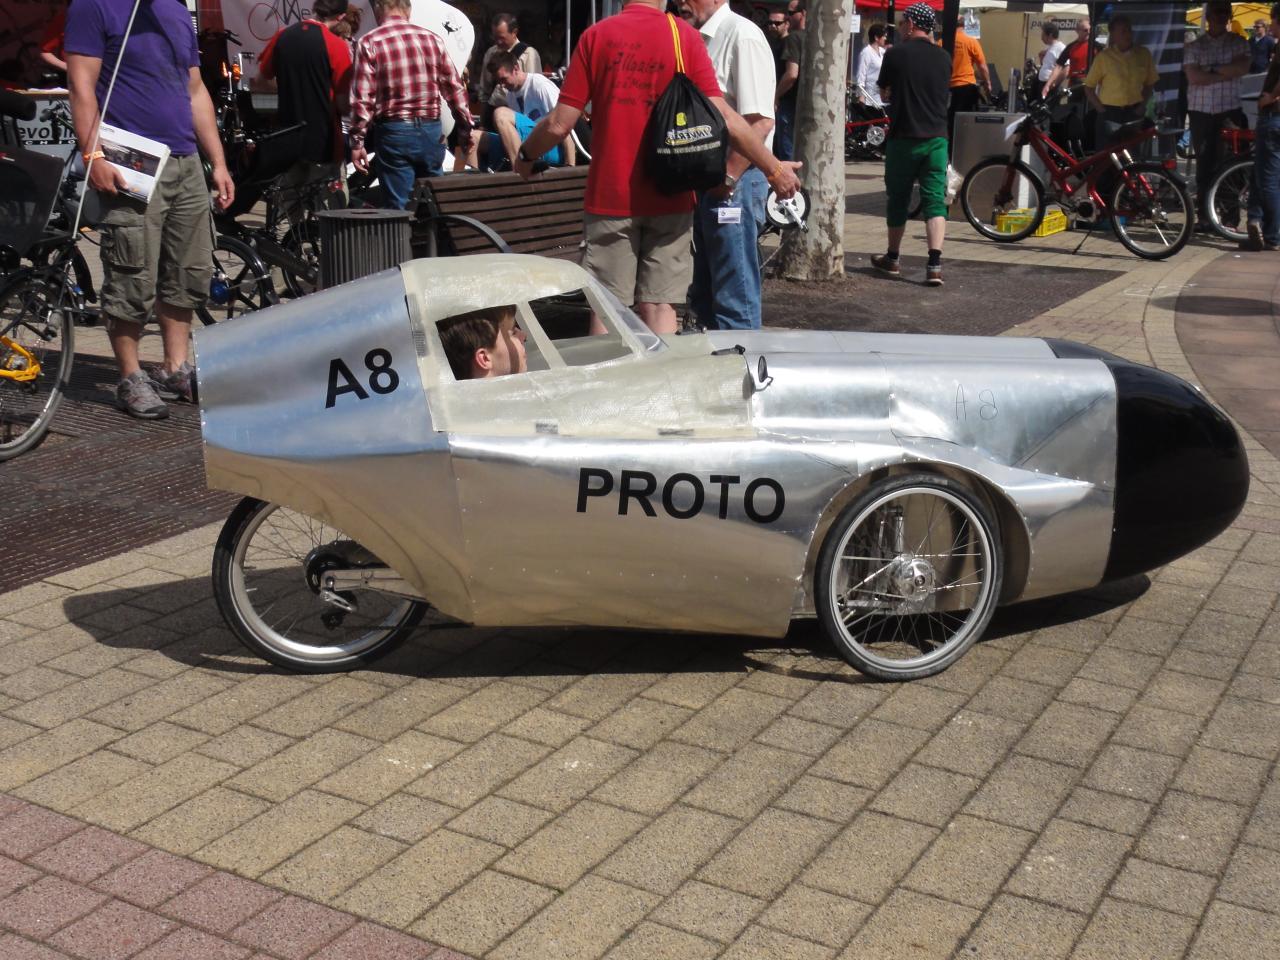 Vélomobile Allweder A8 Proto